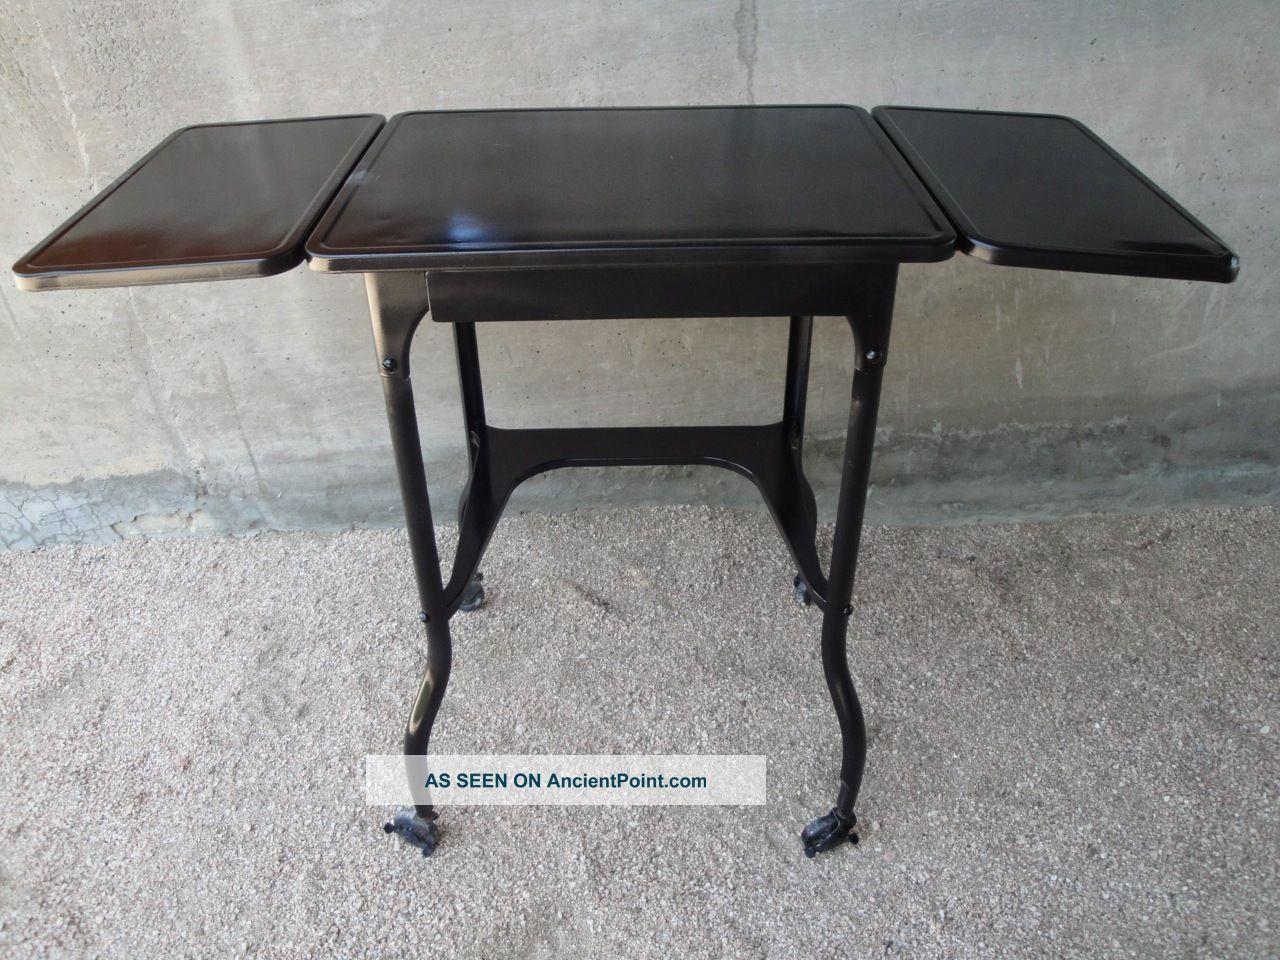 Vintage Mid Century Black Metal Industrial Typewriter Table 1900-1950 photo